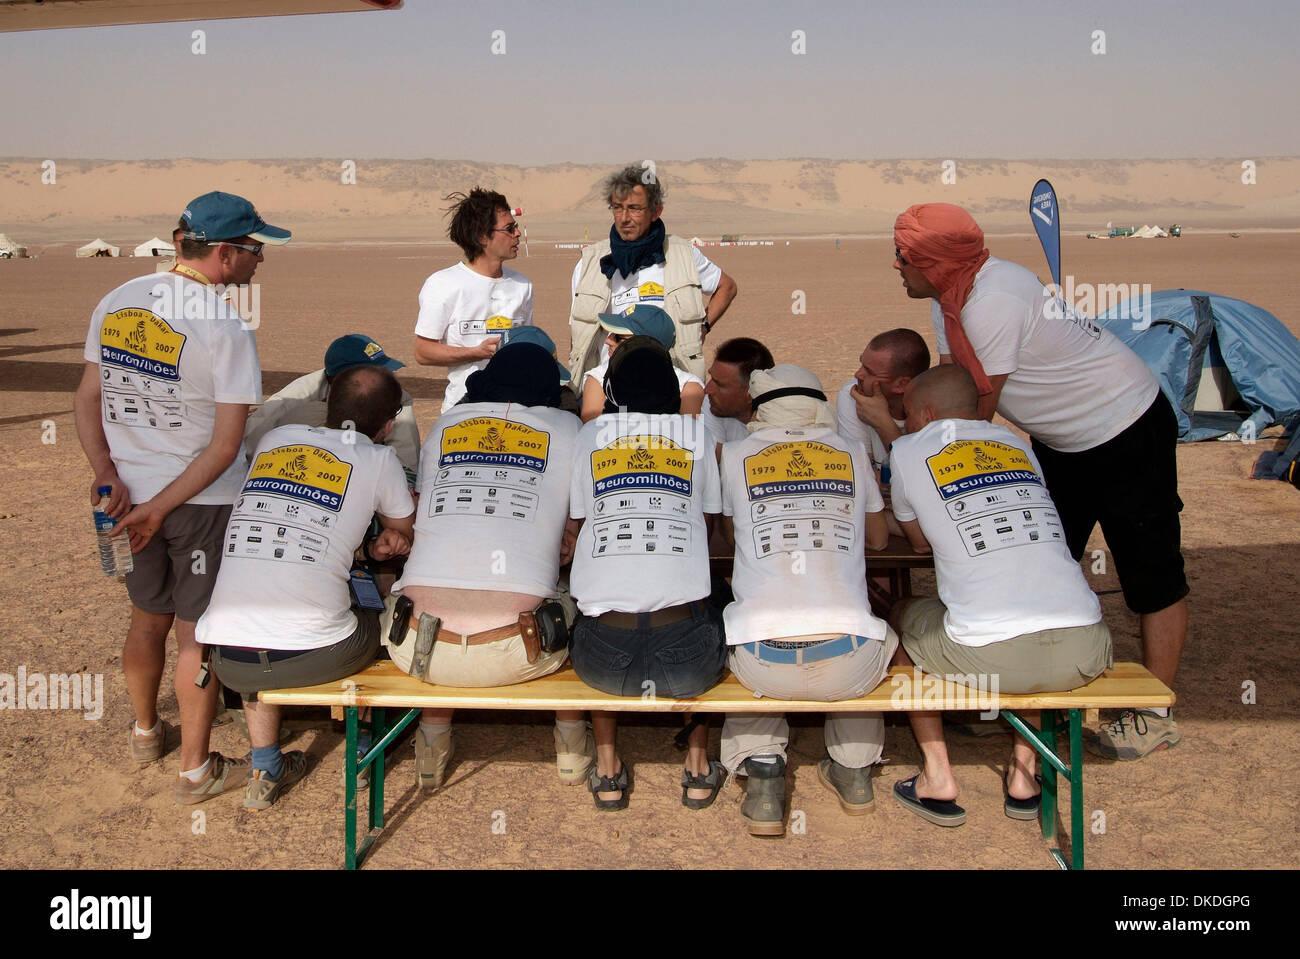 Jan 15, 2007 - Tichit, Mauritania - Stage 9 of the Rallye Lisboa - Dakar 2007  Tichit - Nema in Mauritania. PICTURED: Rally organisers meet in the desert. (Credit Image: © Olivier Pojzman/ZUMA Press) - Stock Image